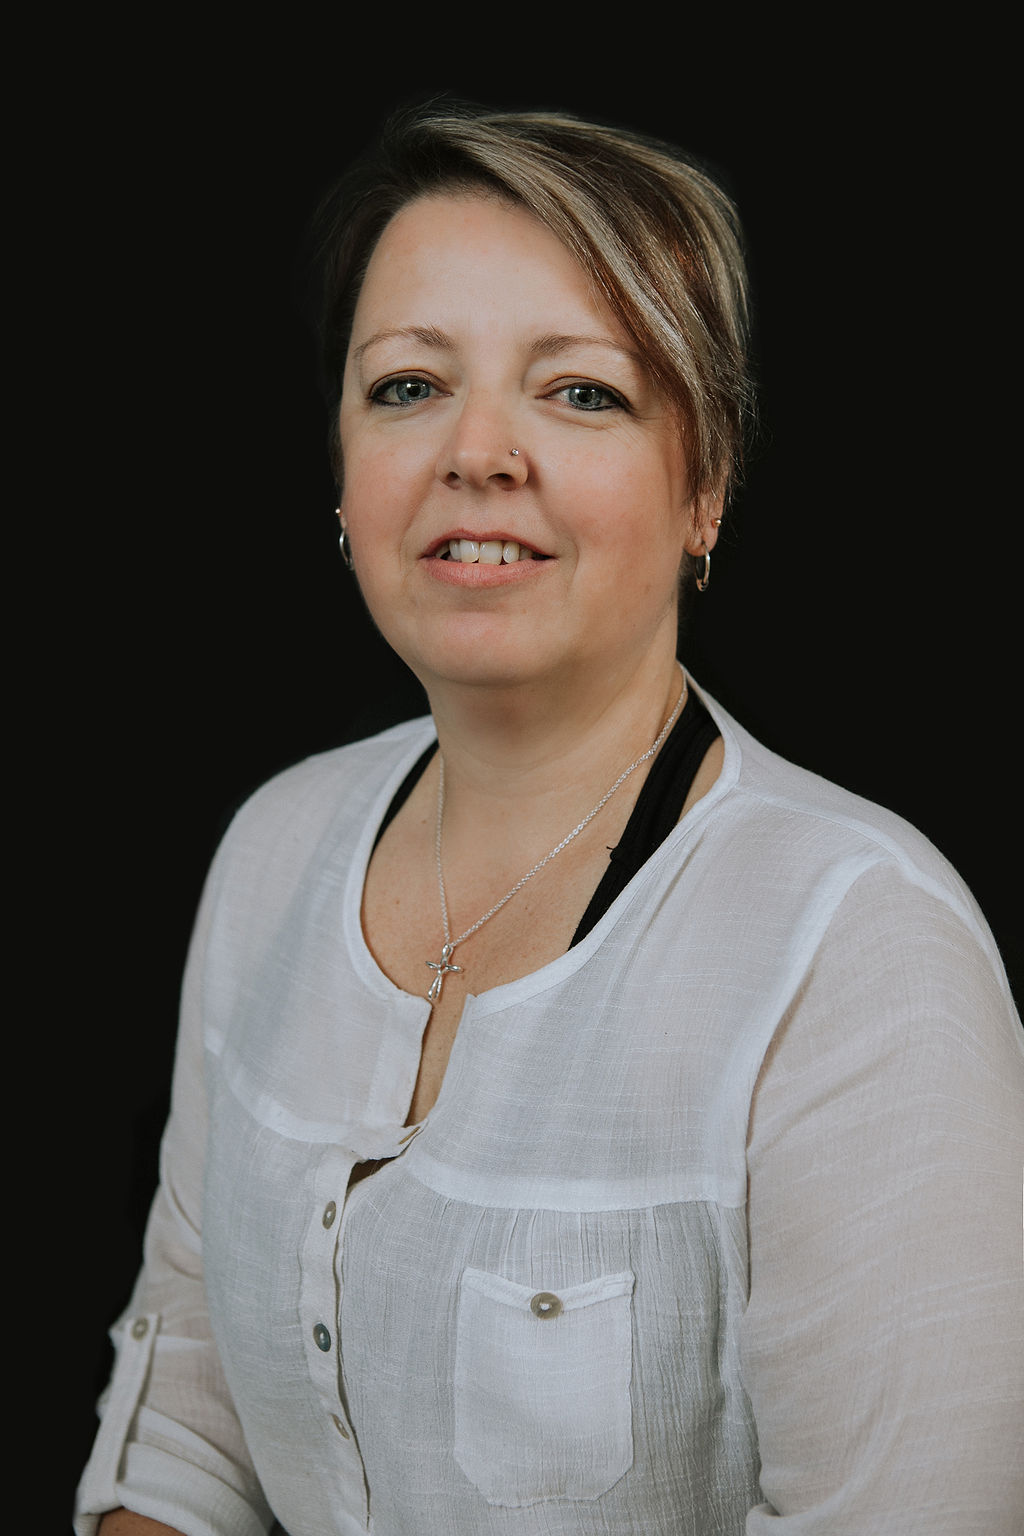 Linda Marais